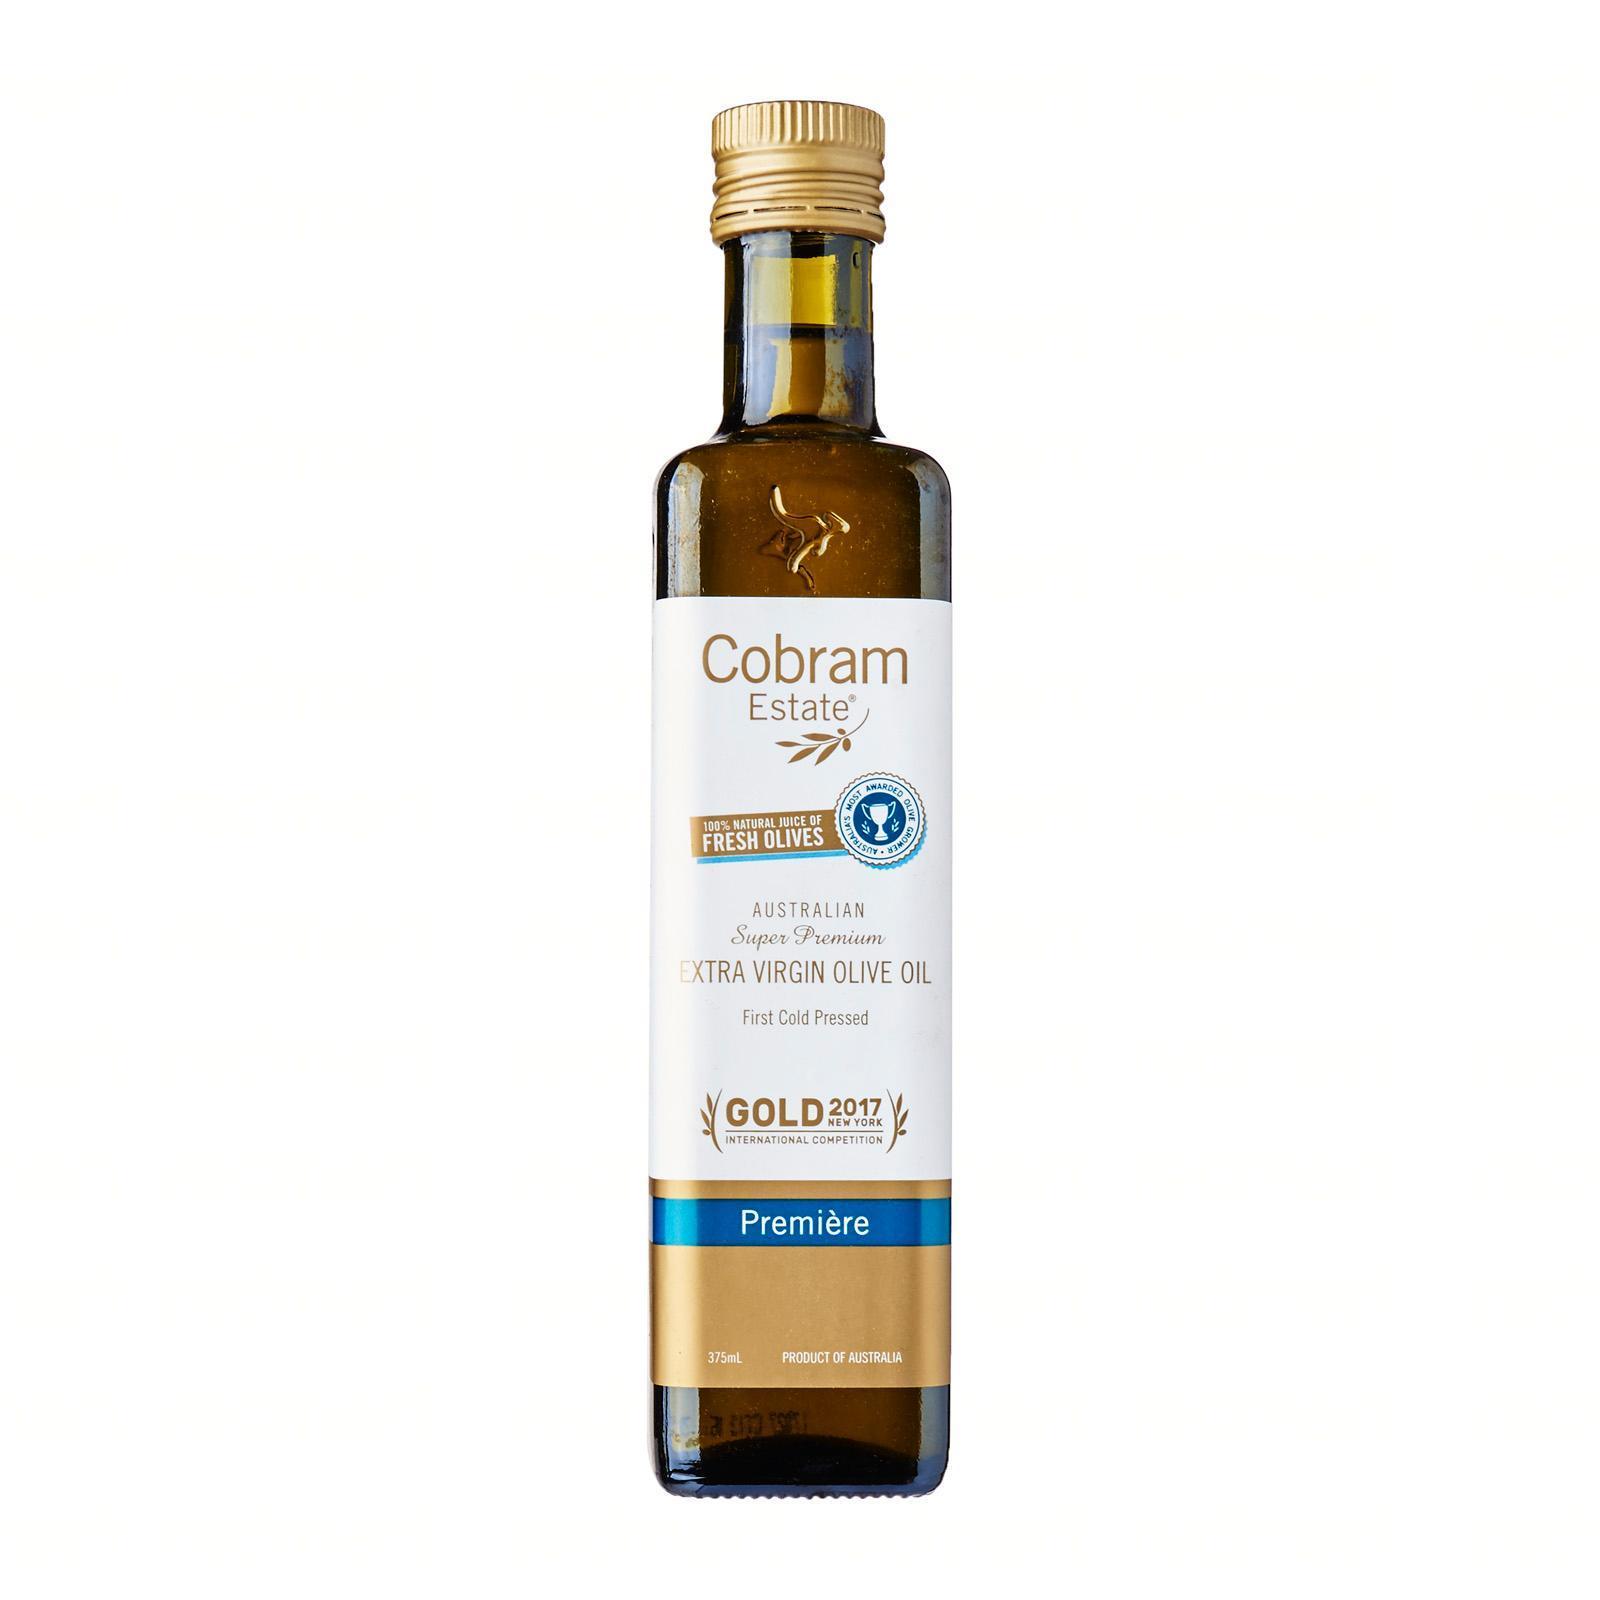 Cobram Estate Premiere Australian Extra Virgin Olive Oil By Redmart.